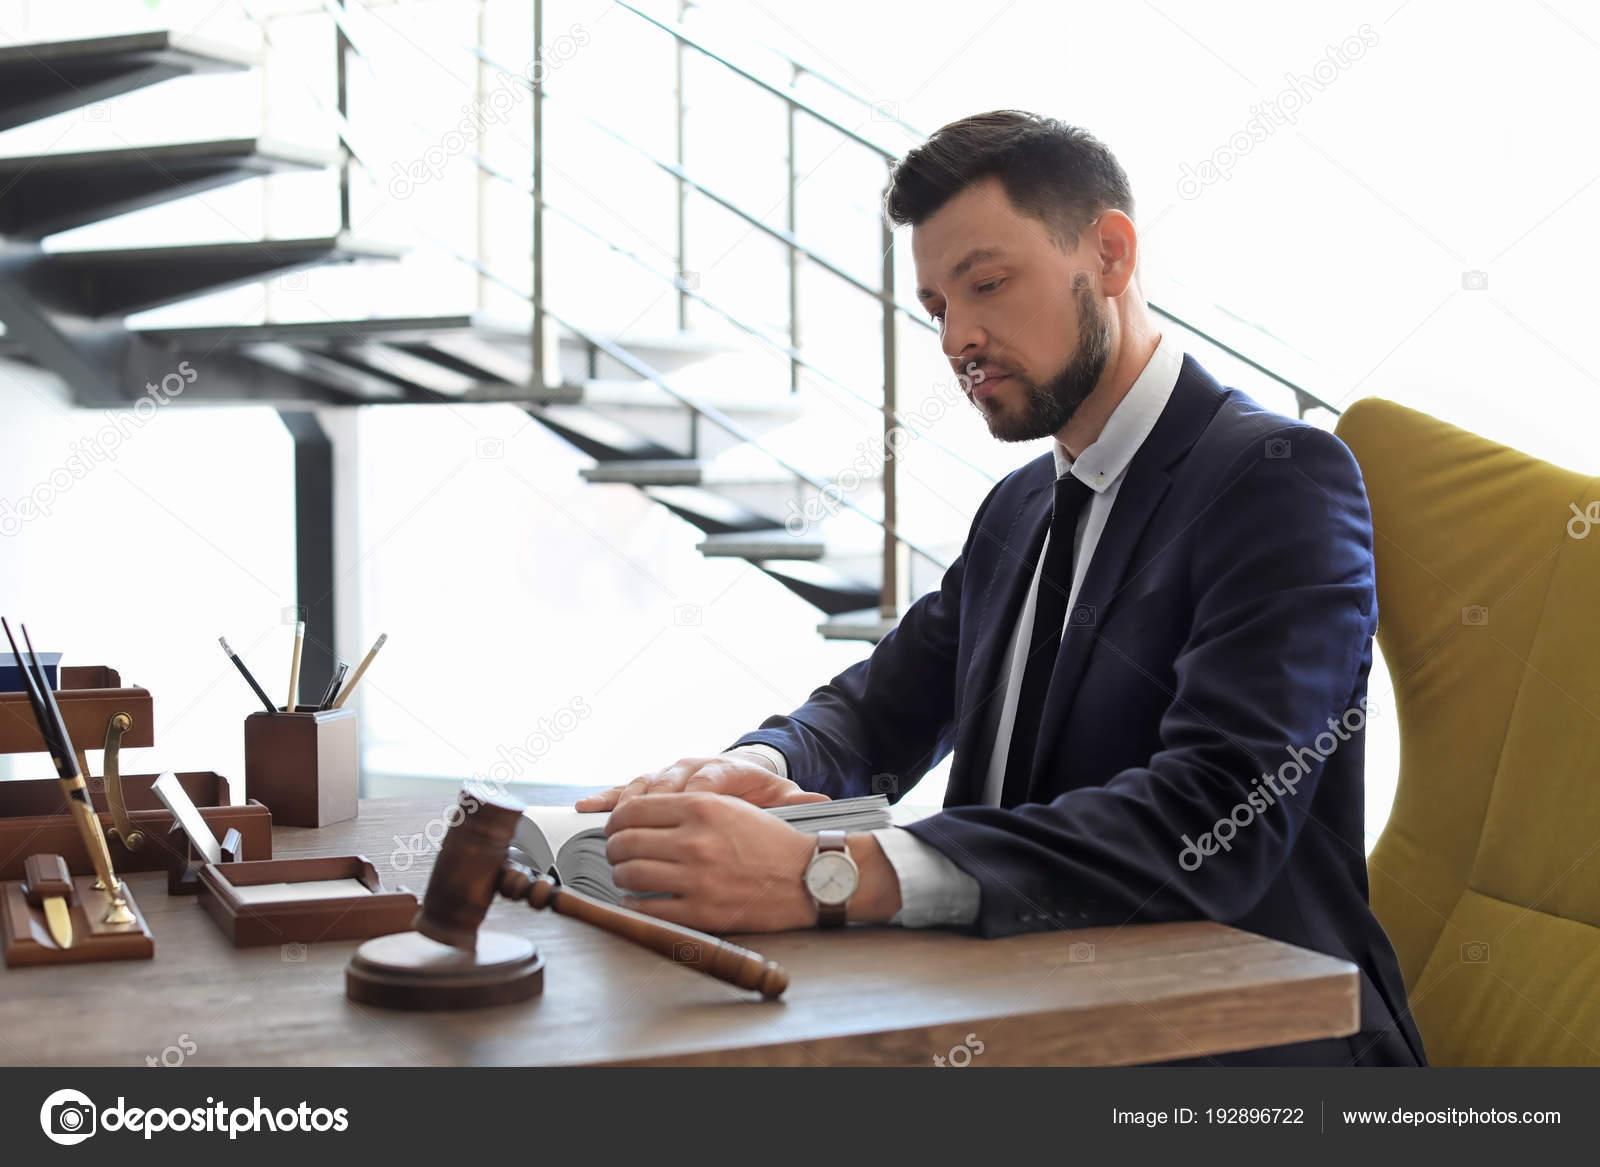 Male lawyer working in office — Stock Photo © liudmilachernetska@gmail.com  #192896722